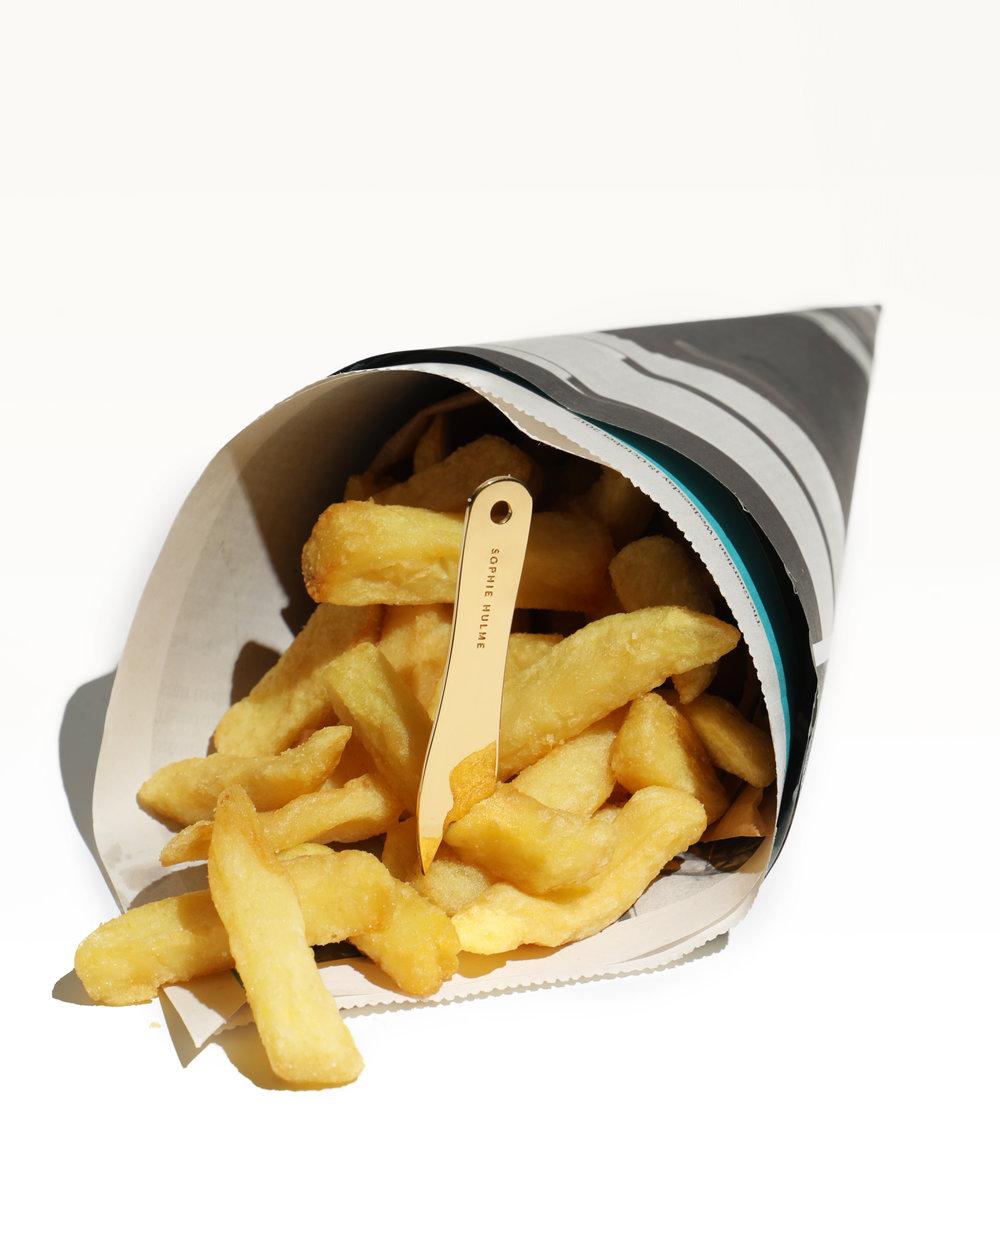 Charm Chip Fork Sophie Hulme